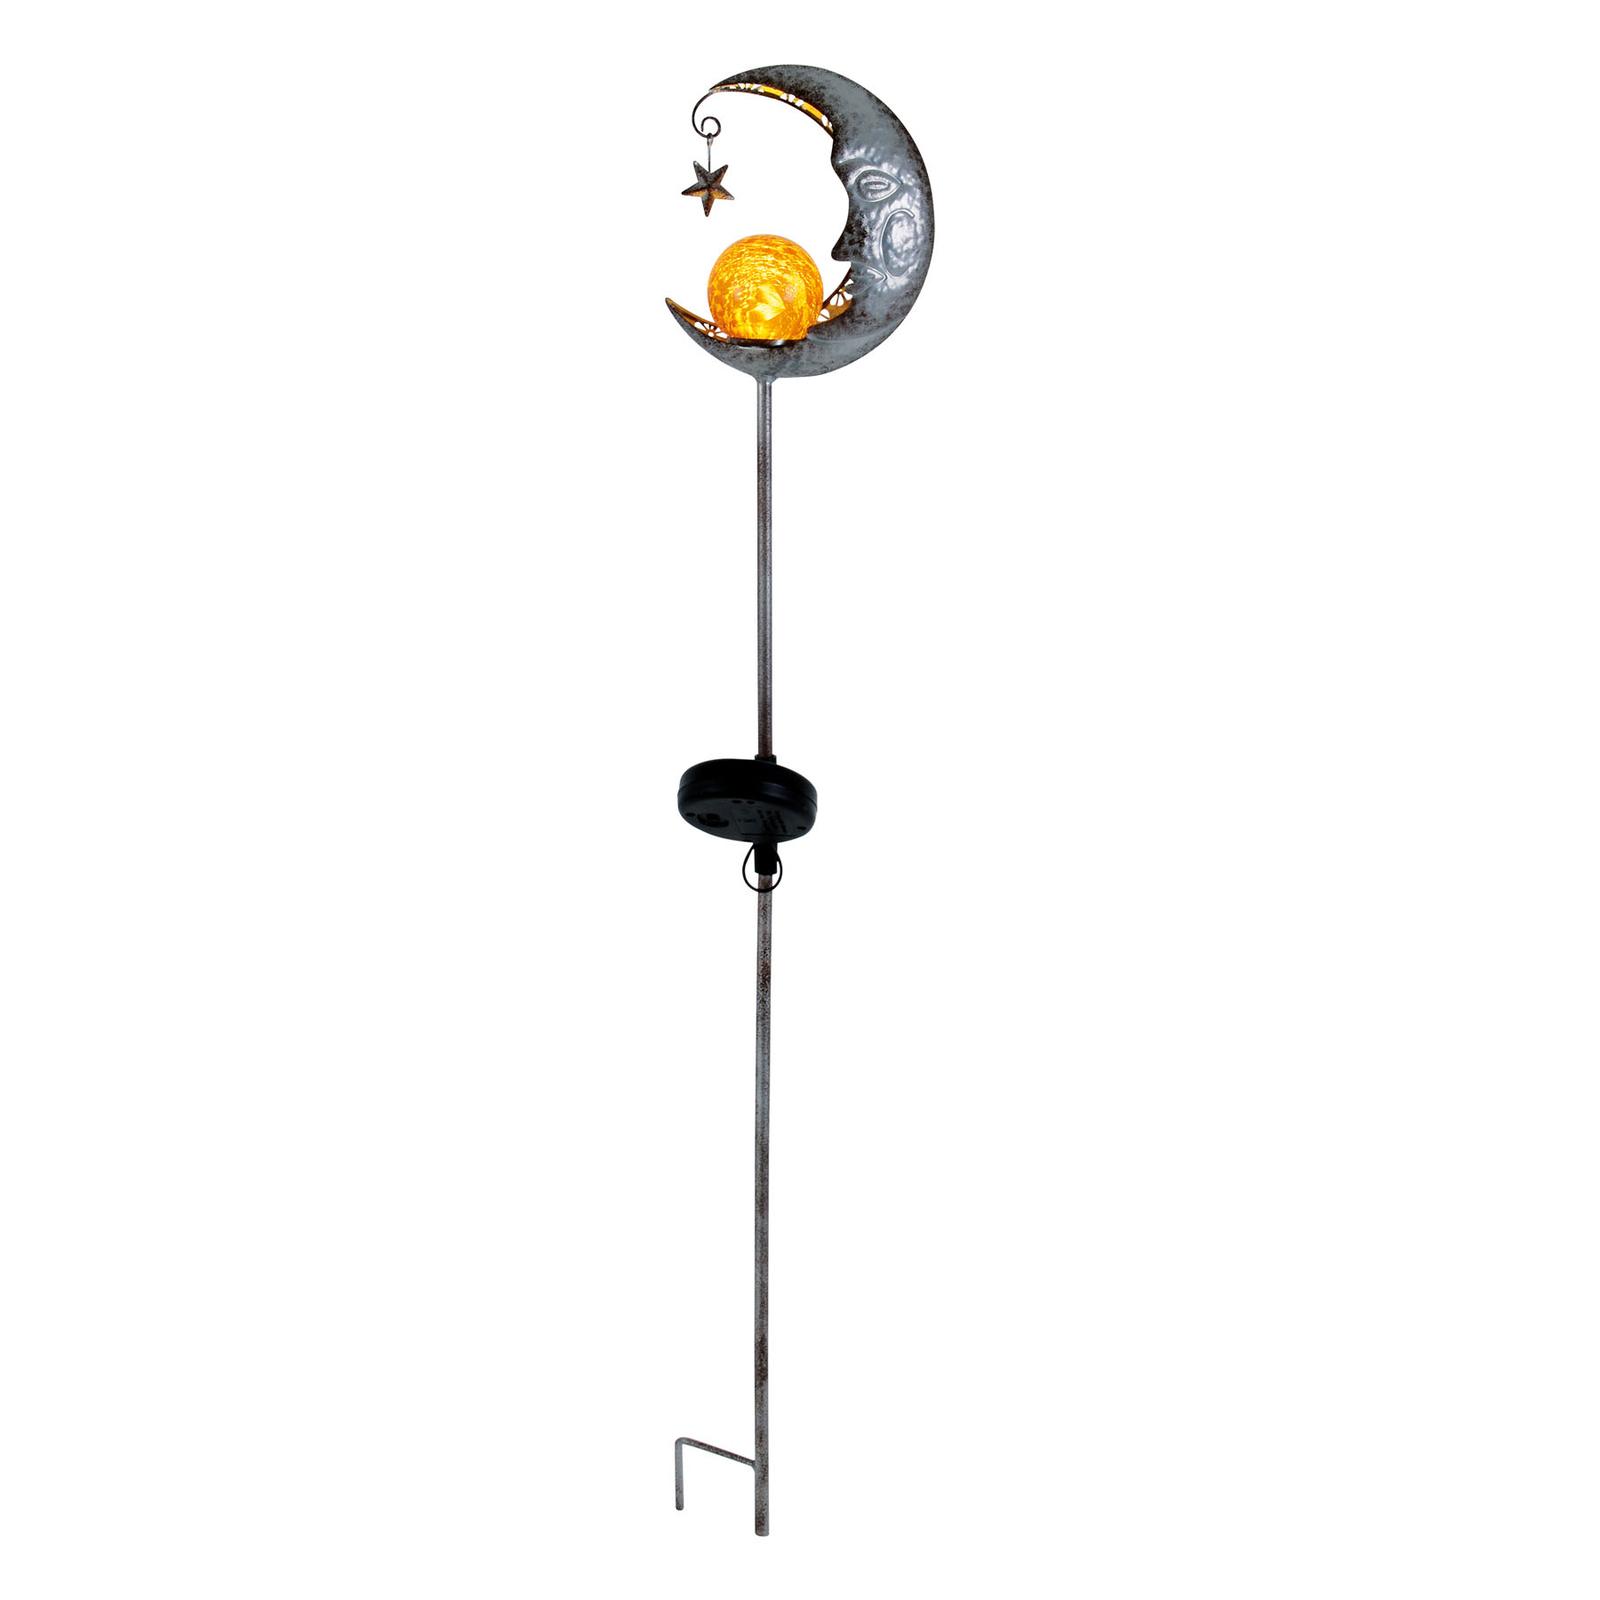 LED-solcellelampe Mond